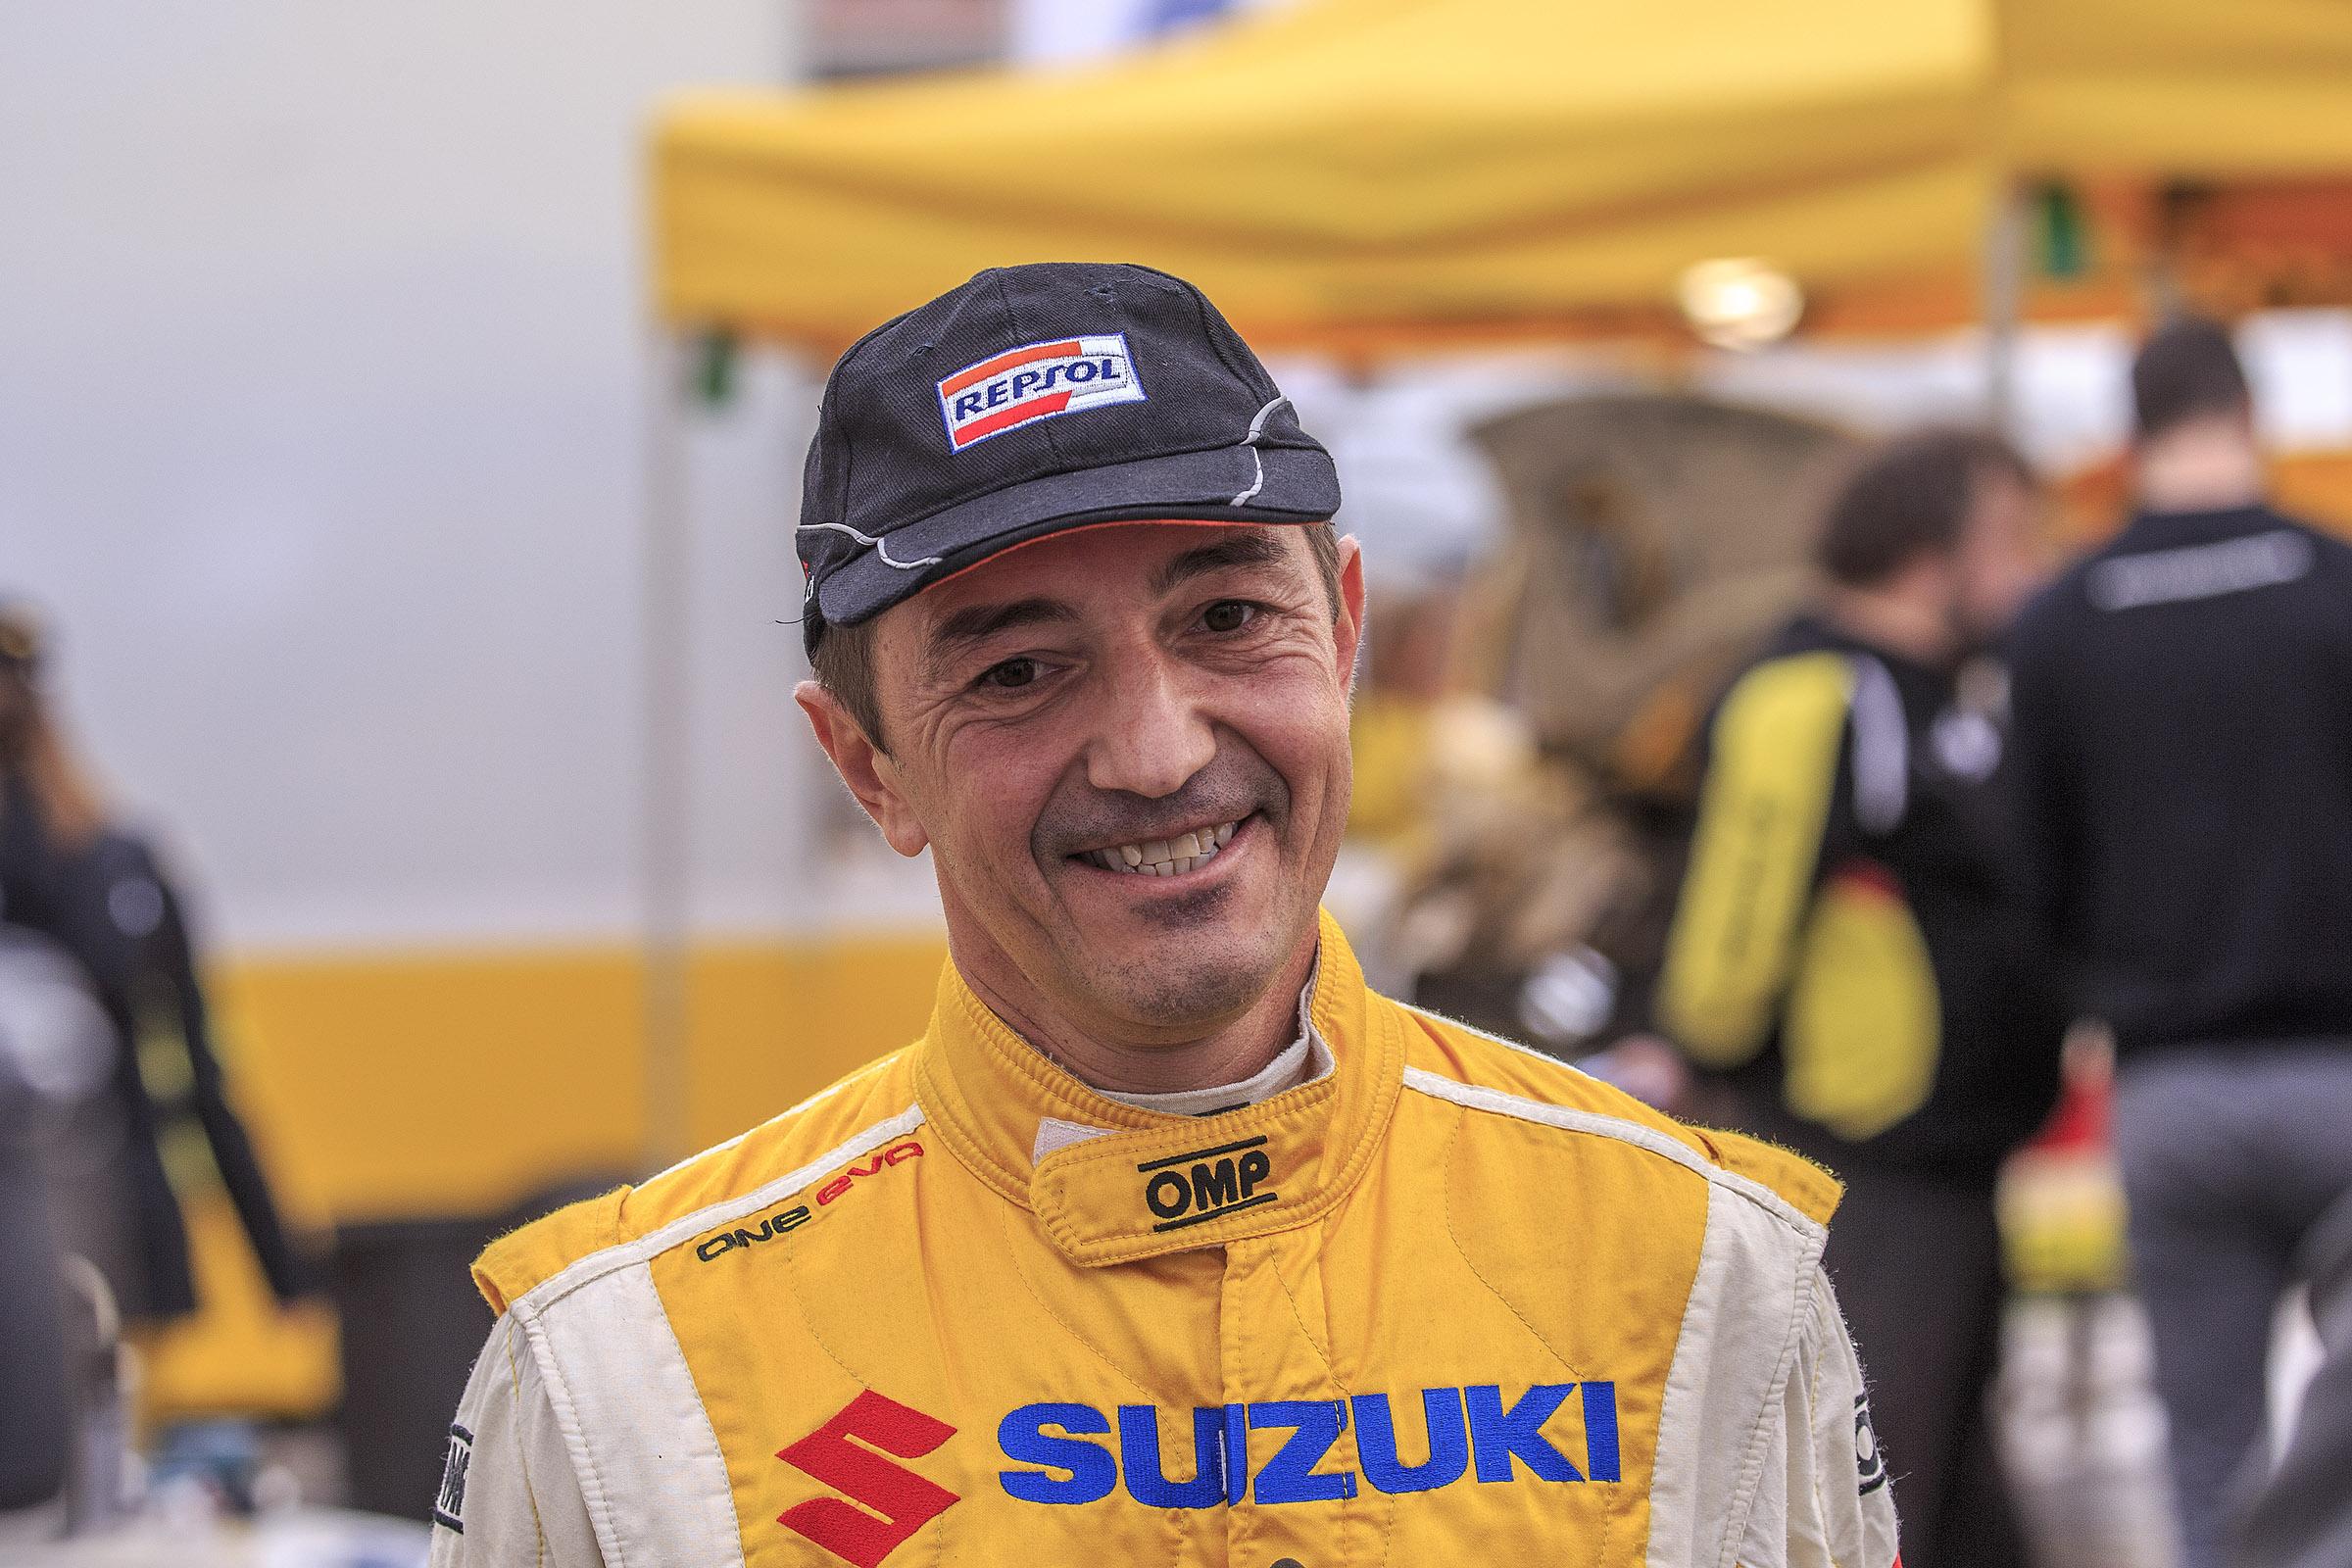 El CAM - RACE sigue siendo gafe para Joan Vinyes - Jordi Mercader